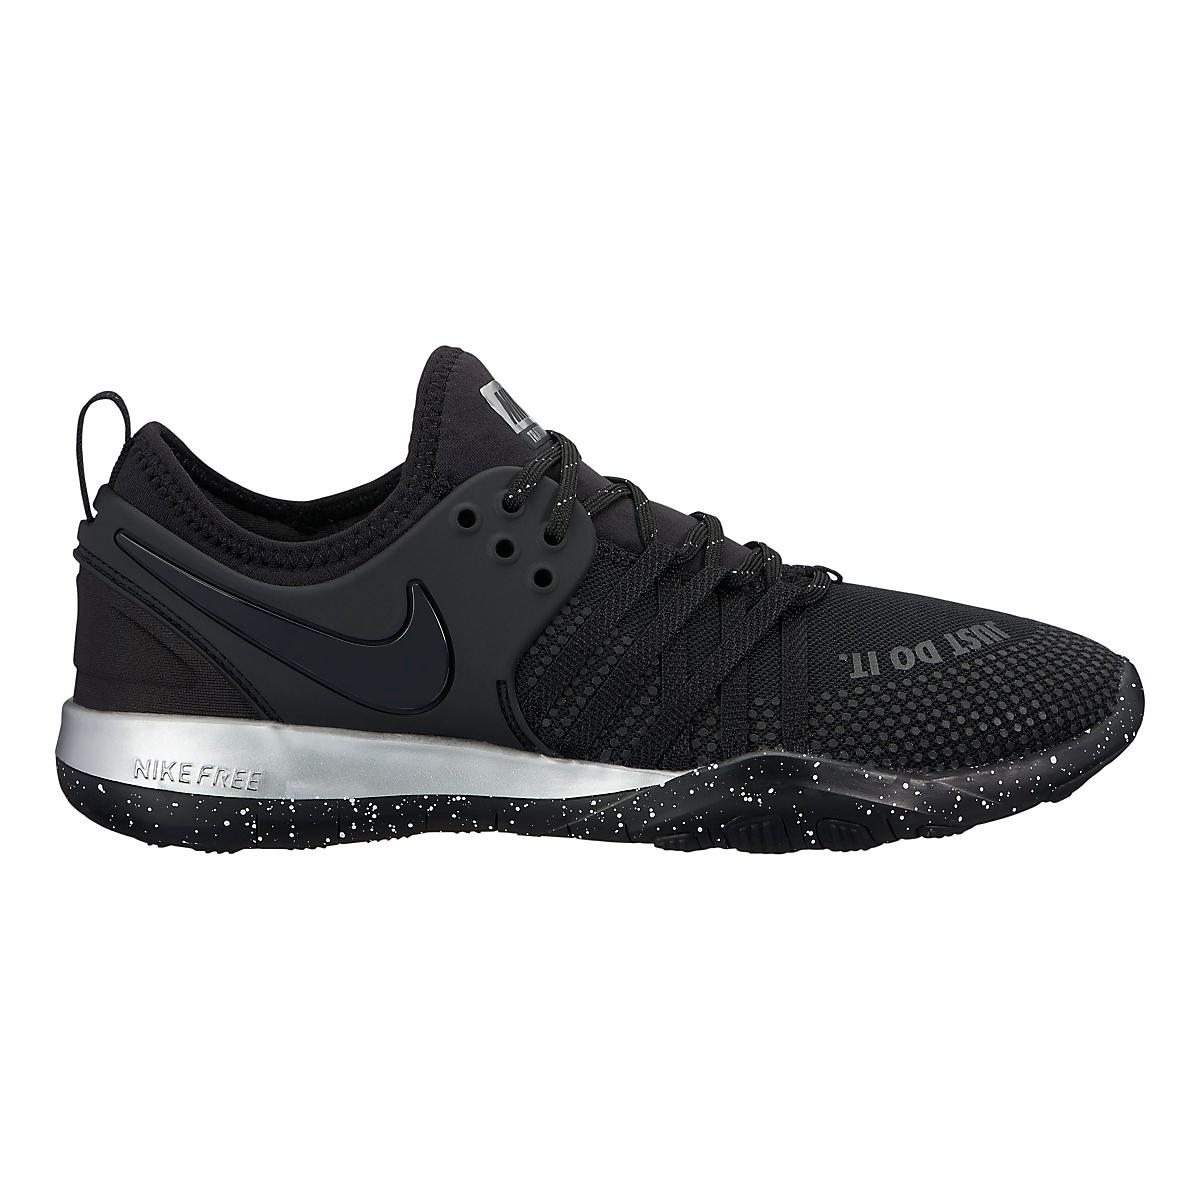 6329f9b5d750 Womens Nike Free TR 7 Selfie Cross Training Shoe at Road Runner Sports